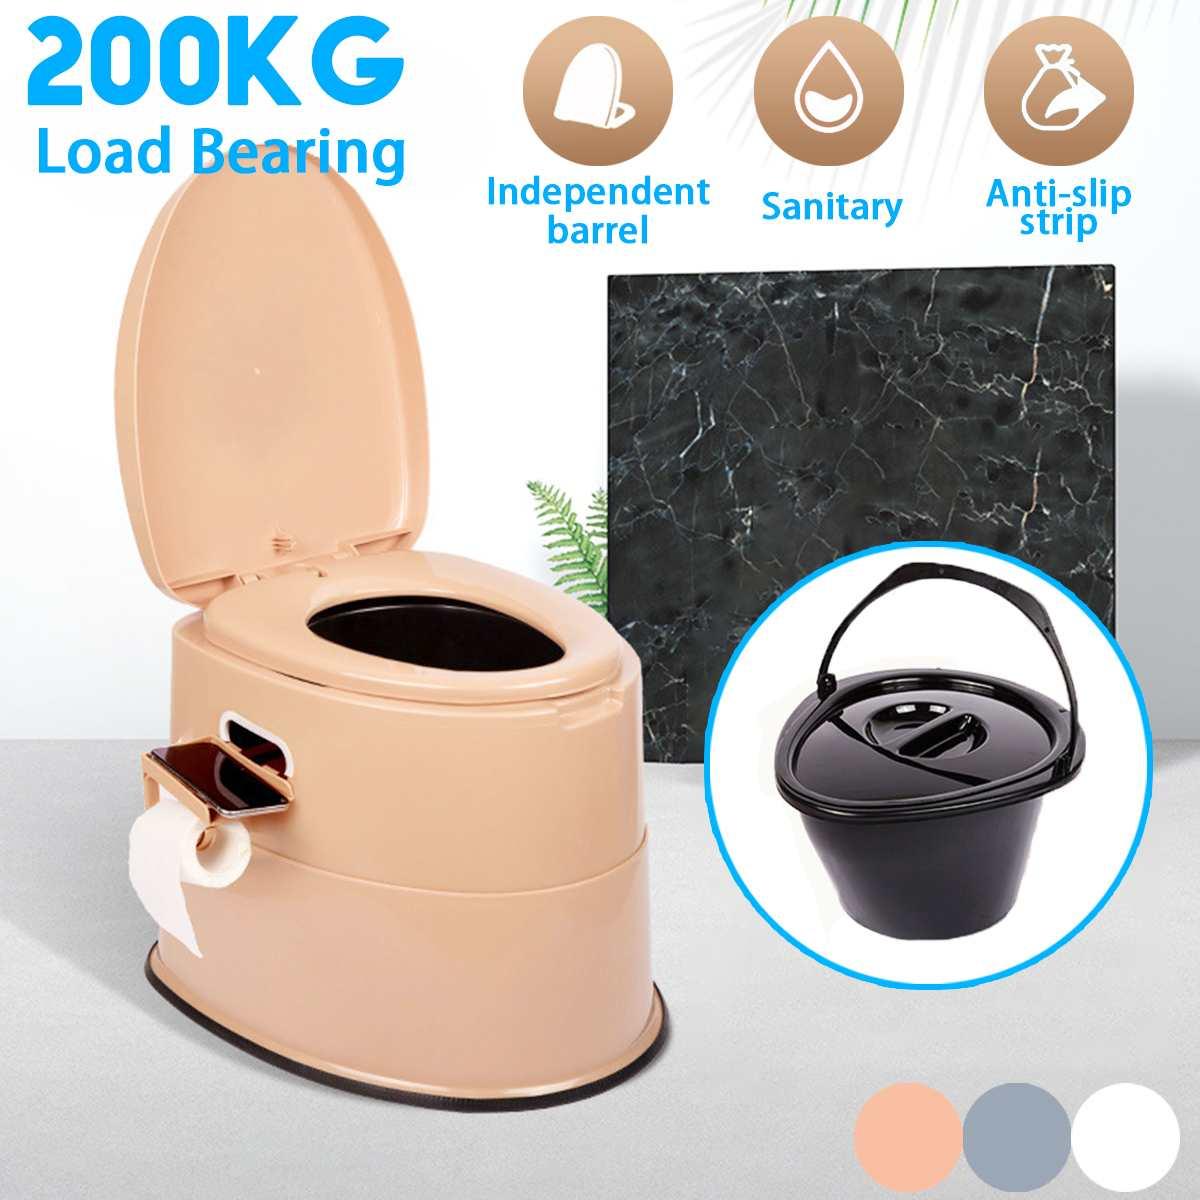 Portable Toilet 200KG Bearing Squatting Elderly Toilet Stool/Pregnant Movable Toilet/ Multifunction Bedpan & Paper Roll Holder